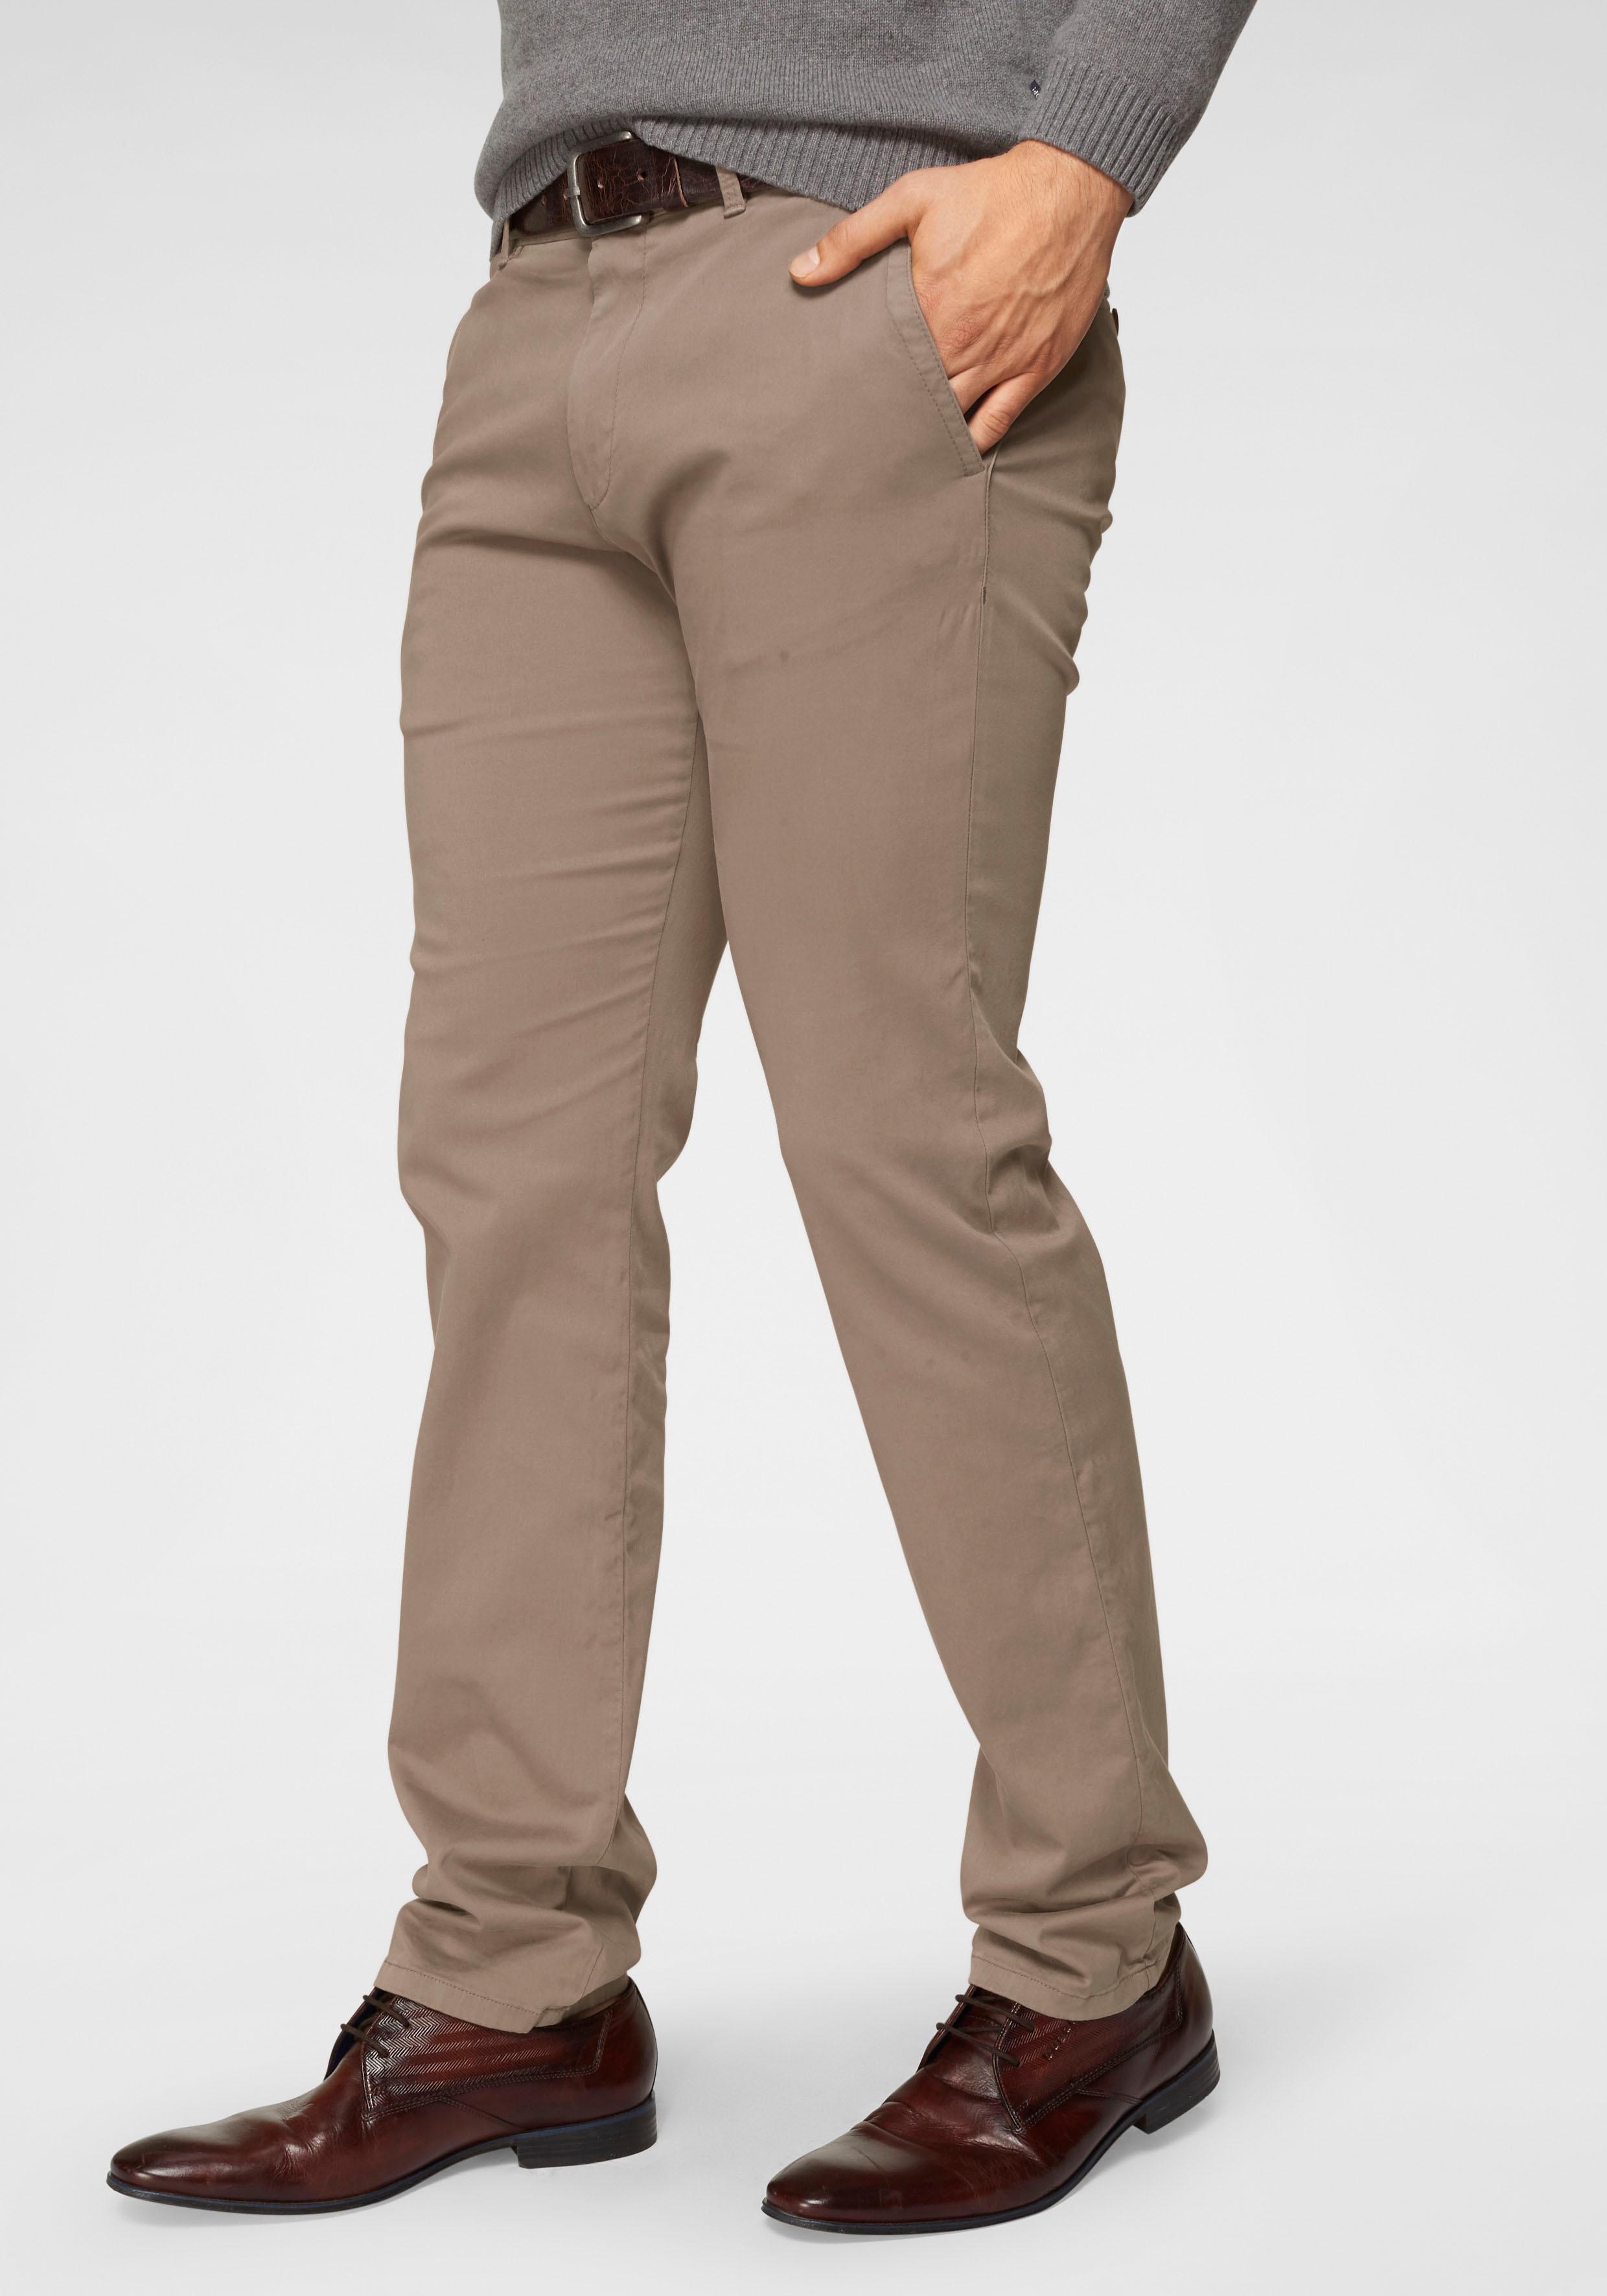 Joop Jeans Chinohose Matthew | Bekleidung > Jeans > Sonstige Jeans | Braun | Joop Jeans